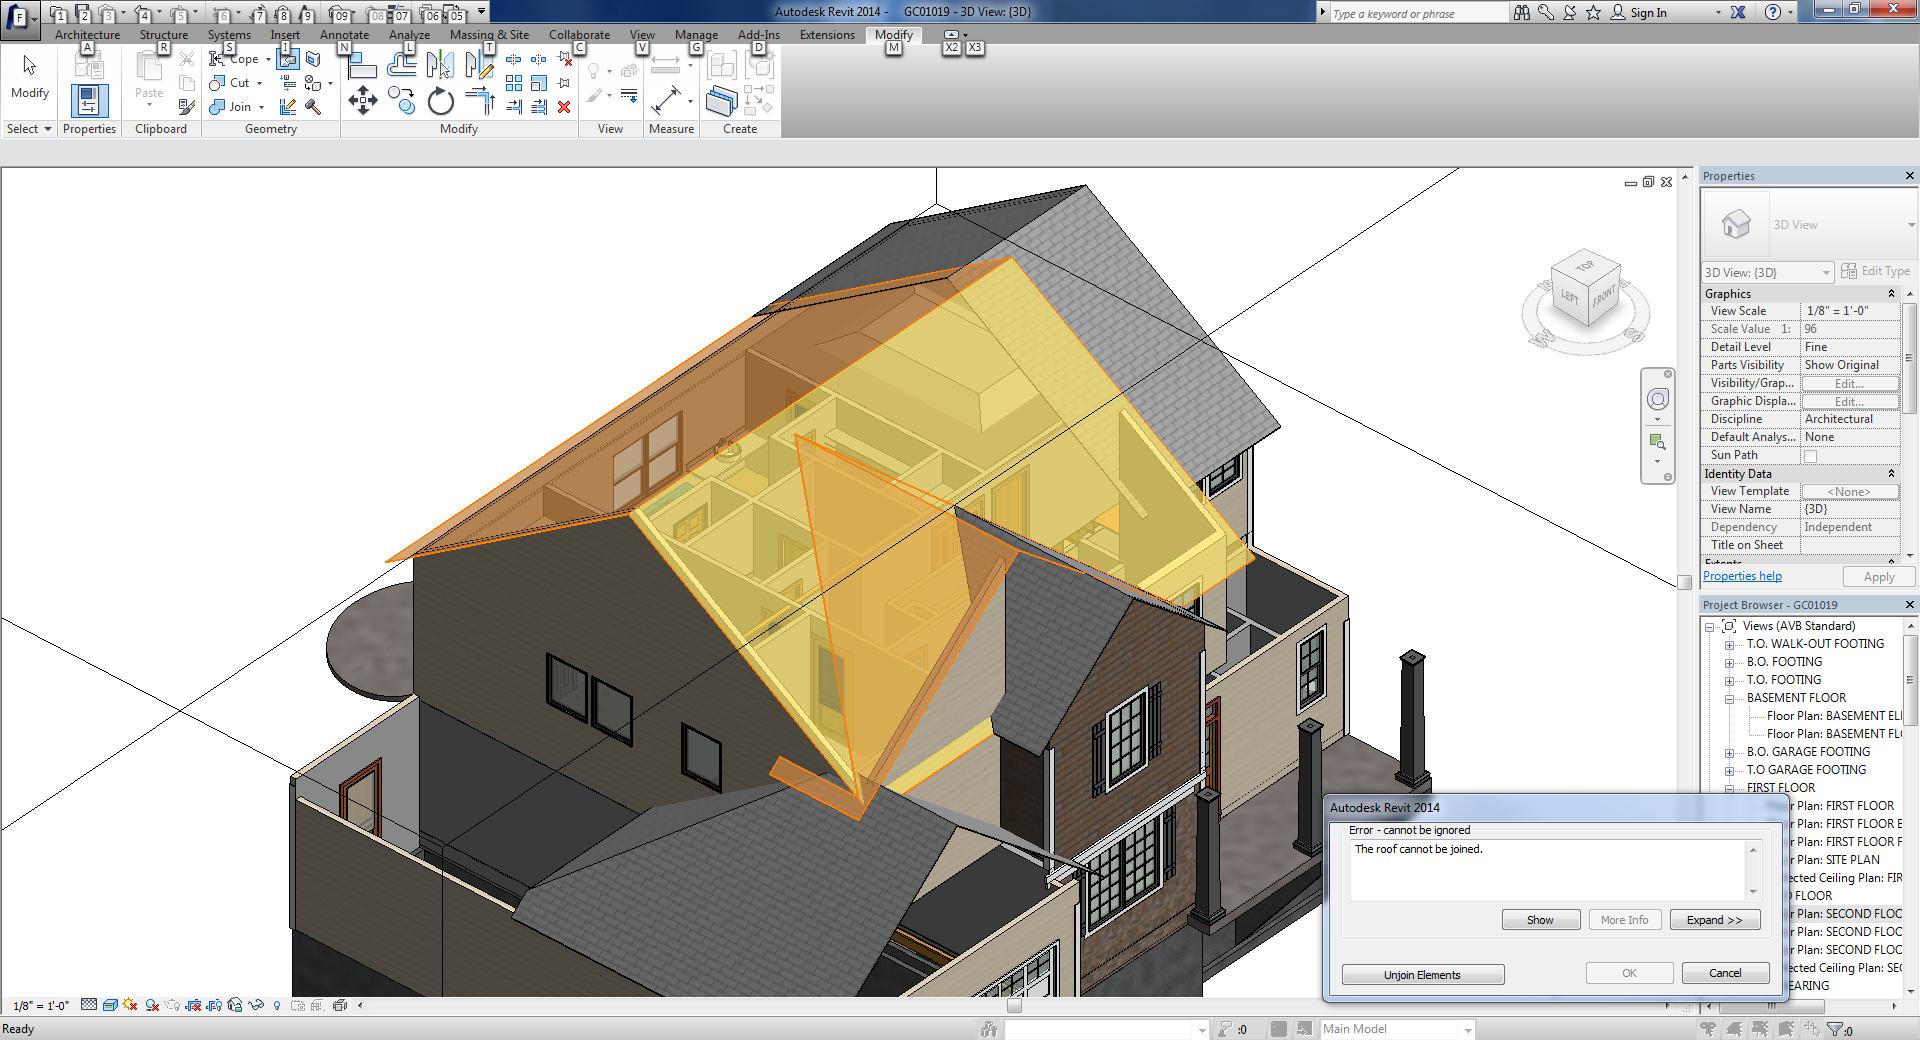 Drawing Lines Revit : Autodesk revit architecture a water treatmet skid for lau flickr